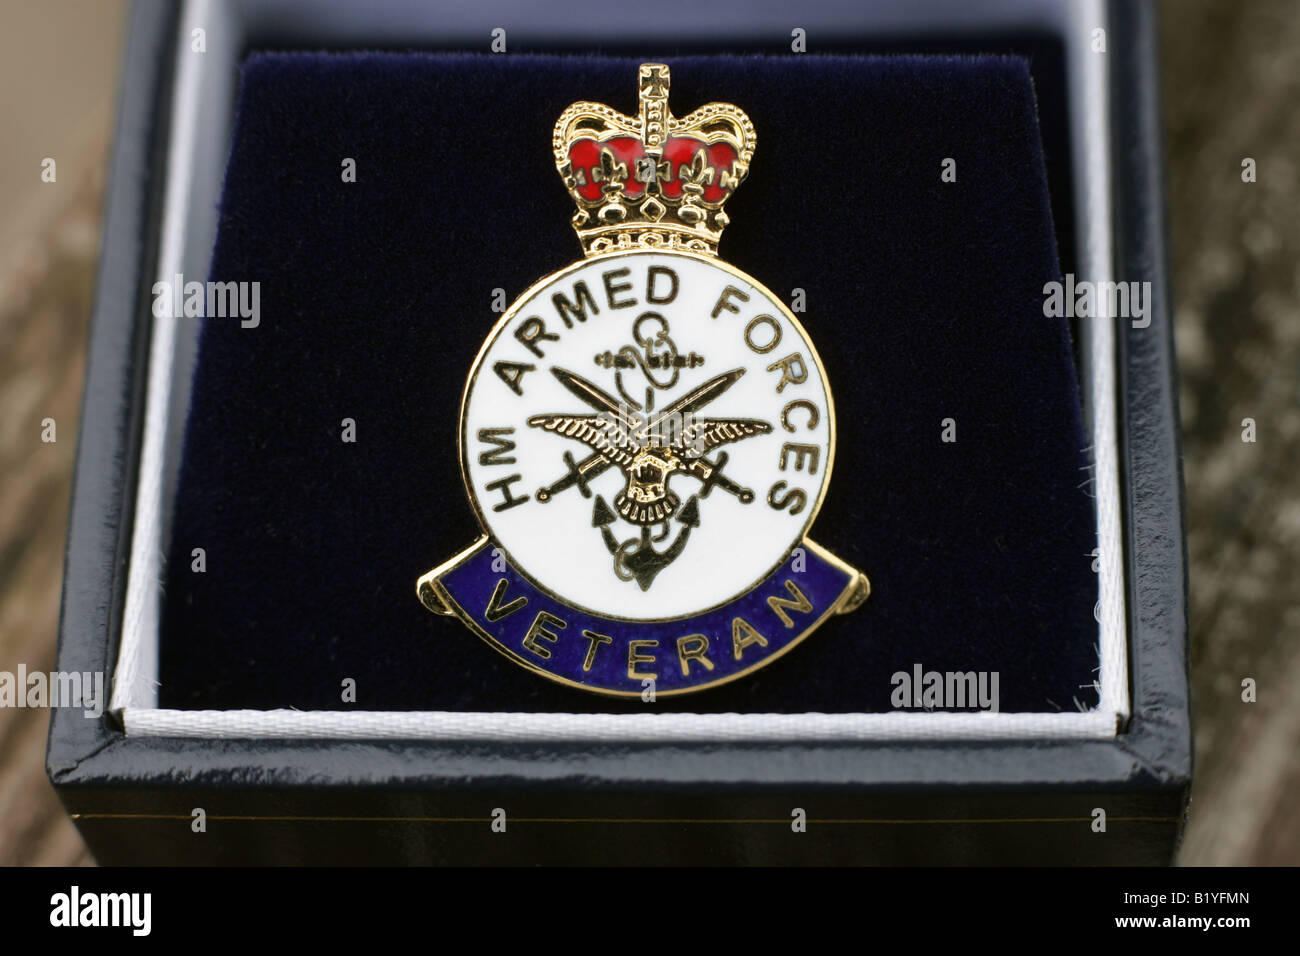 HM Armed Forces No 1 Parachute Training School Veteran lapel pin badge .